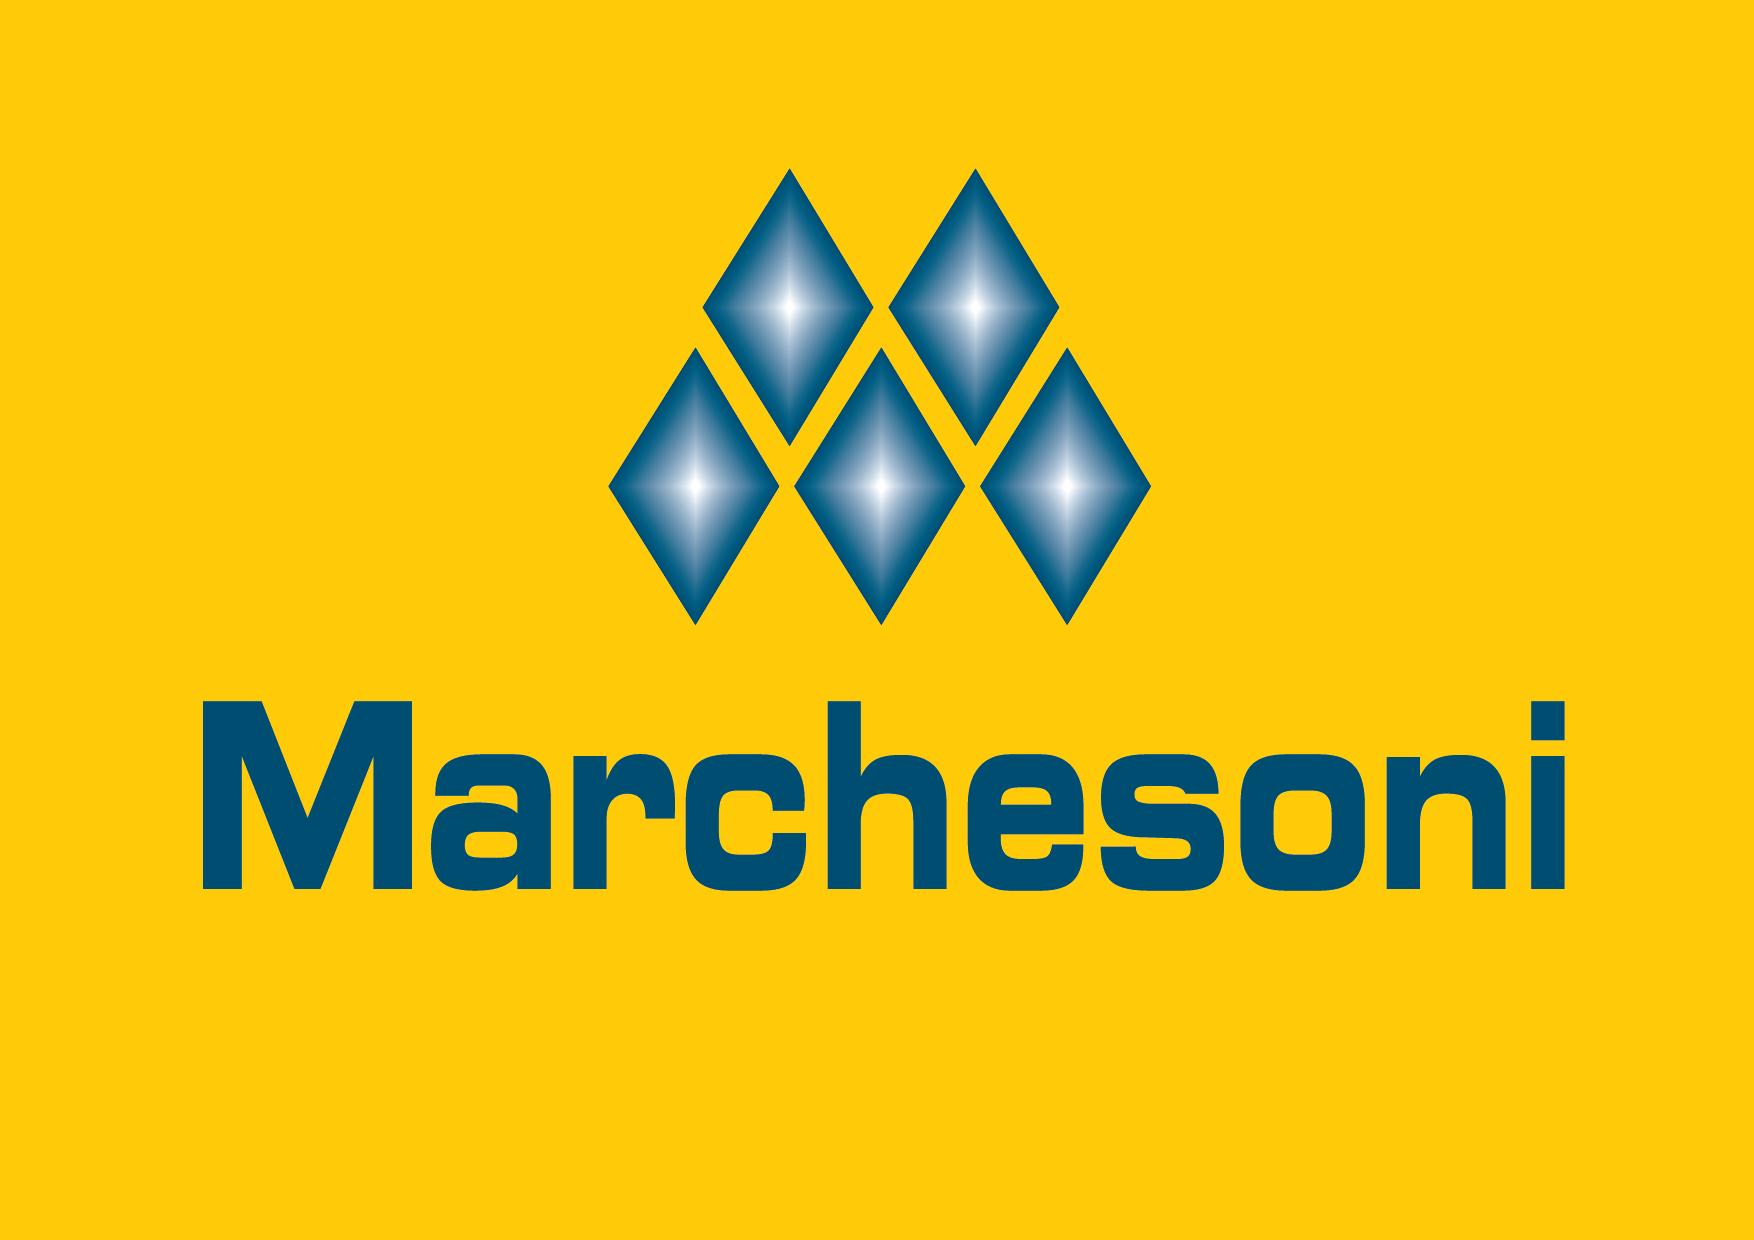 Estufa Fria c/ 6 Gelo-X Marchesoni 55 CM - EF.7.030  - Carmel Equipamentos